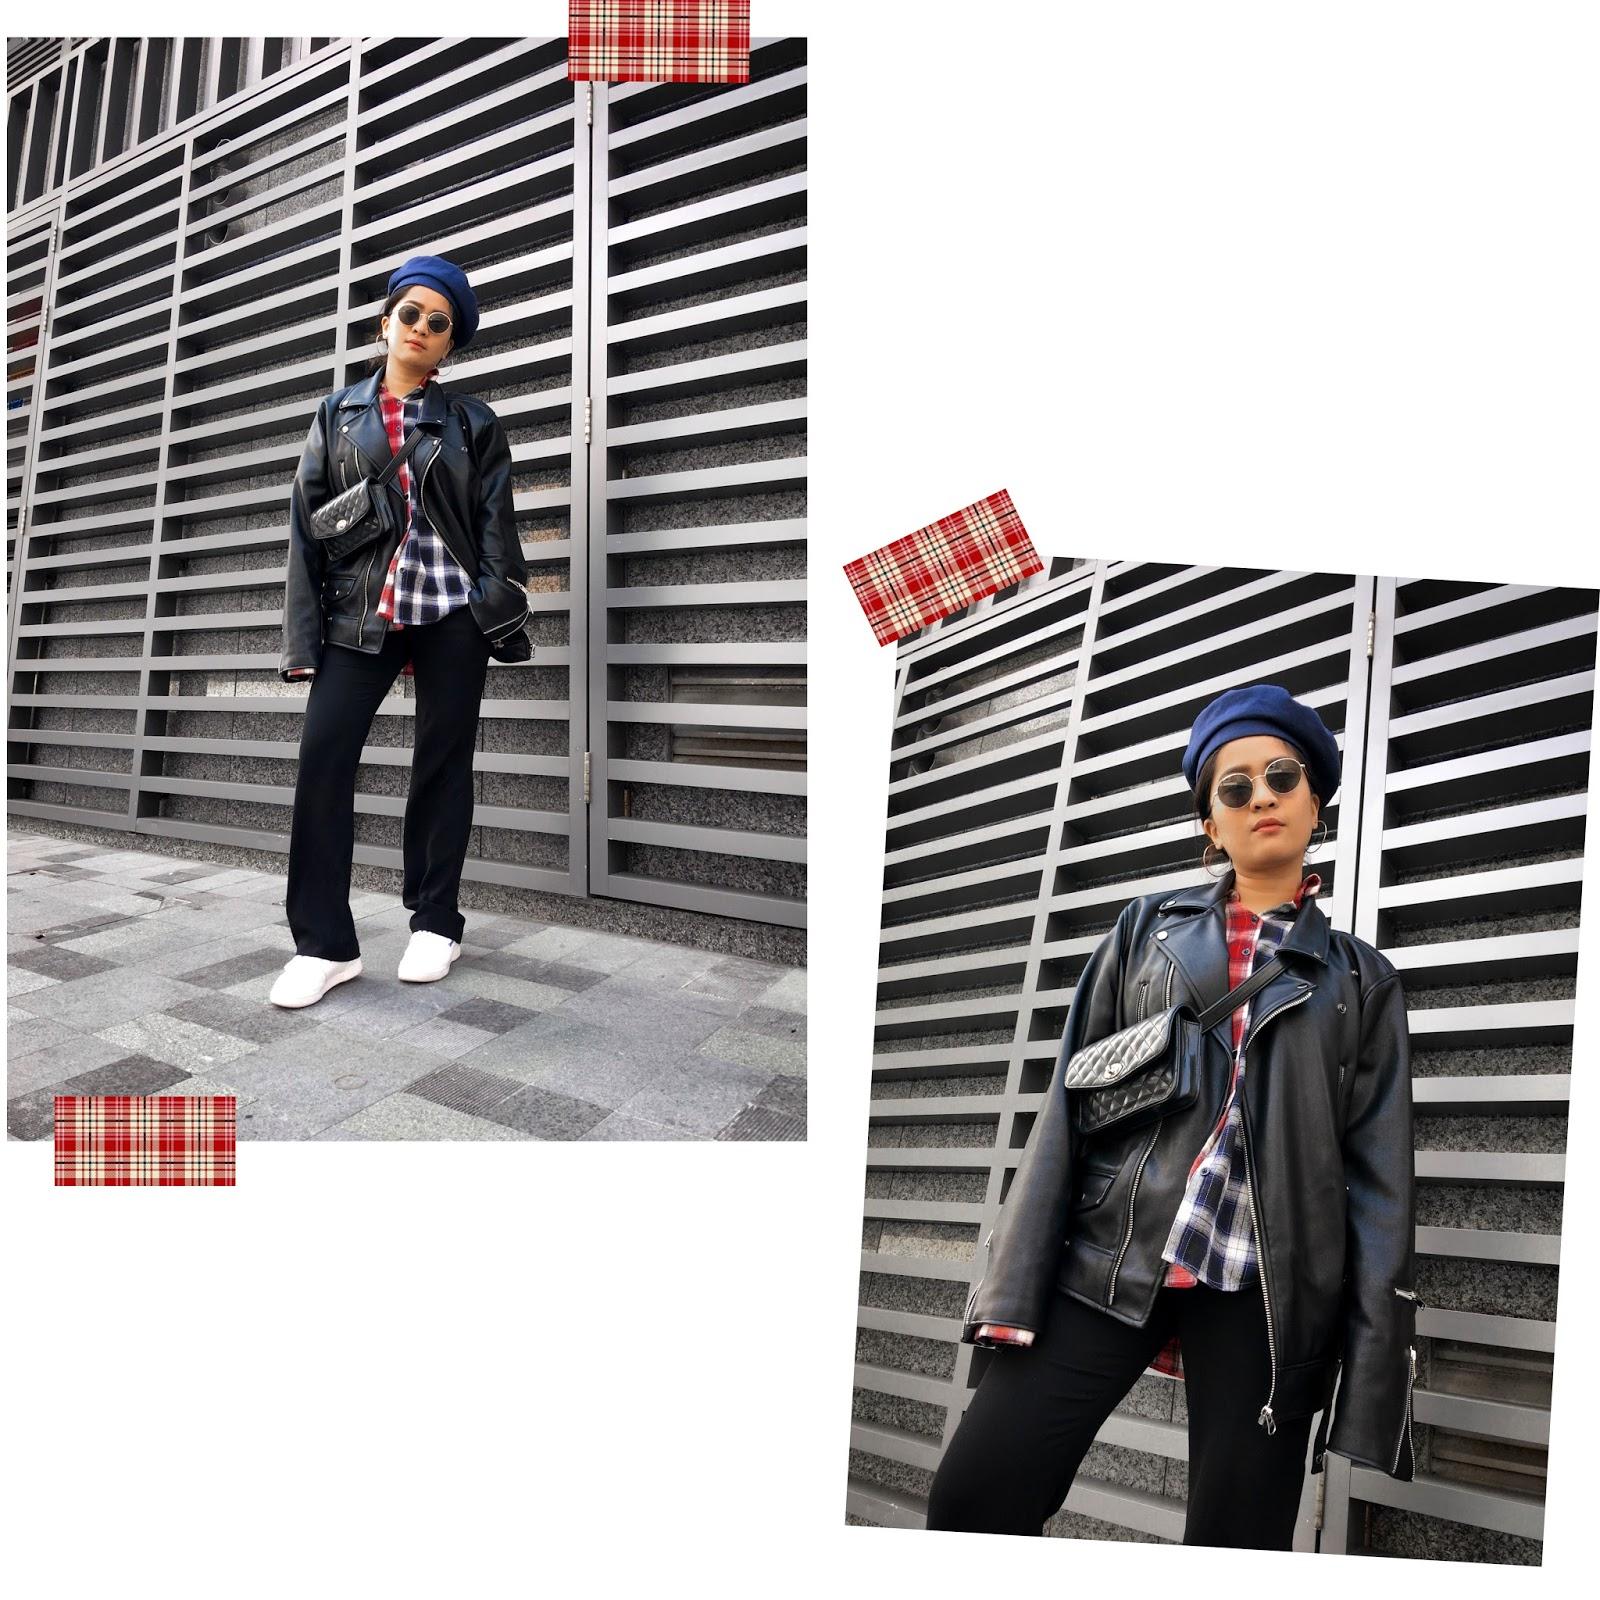 macau fashion blogger wearing plaid outfits